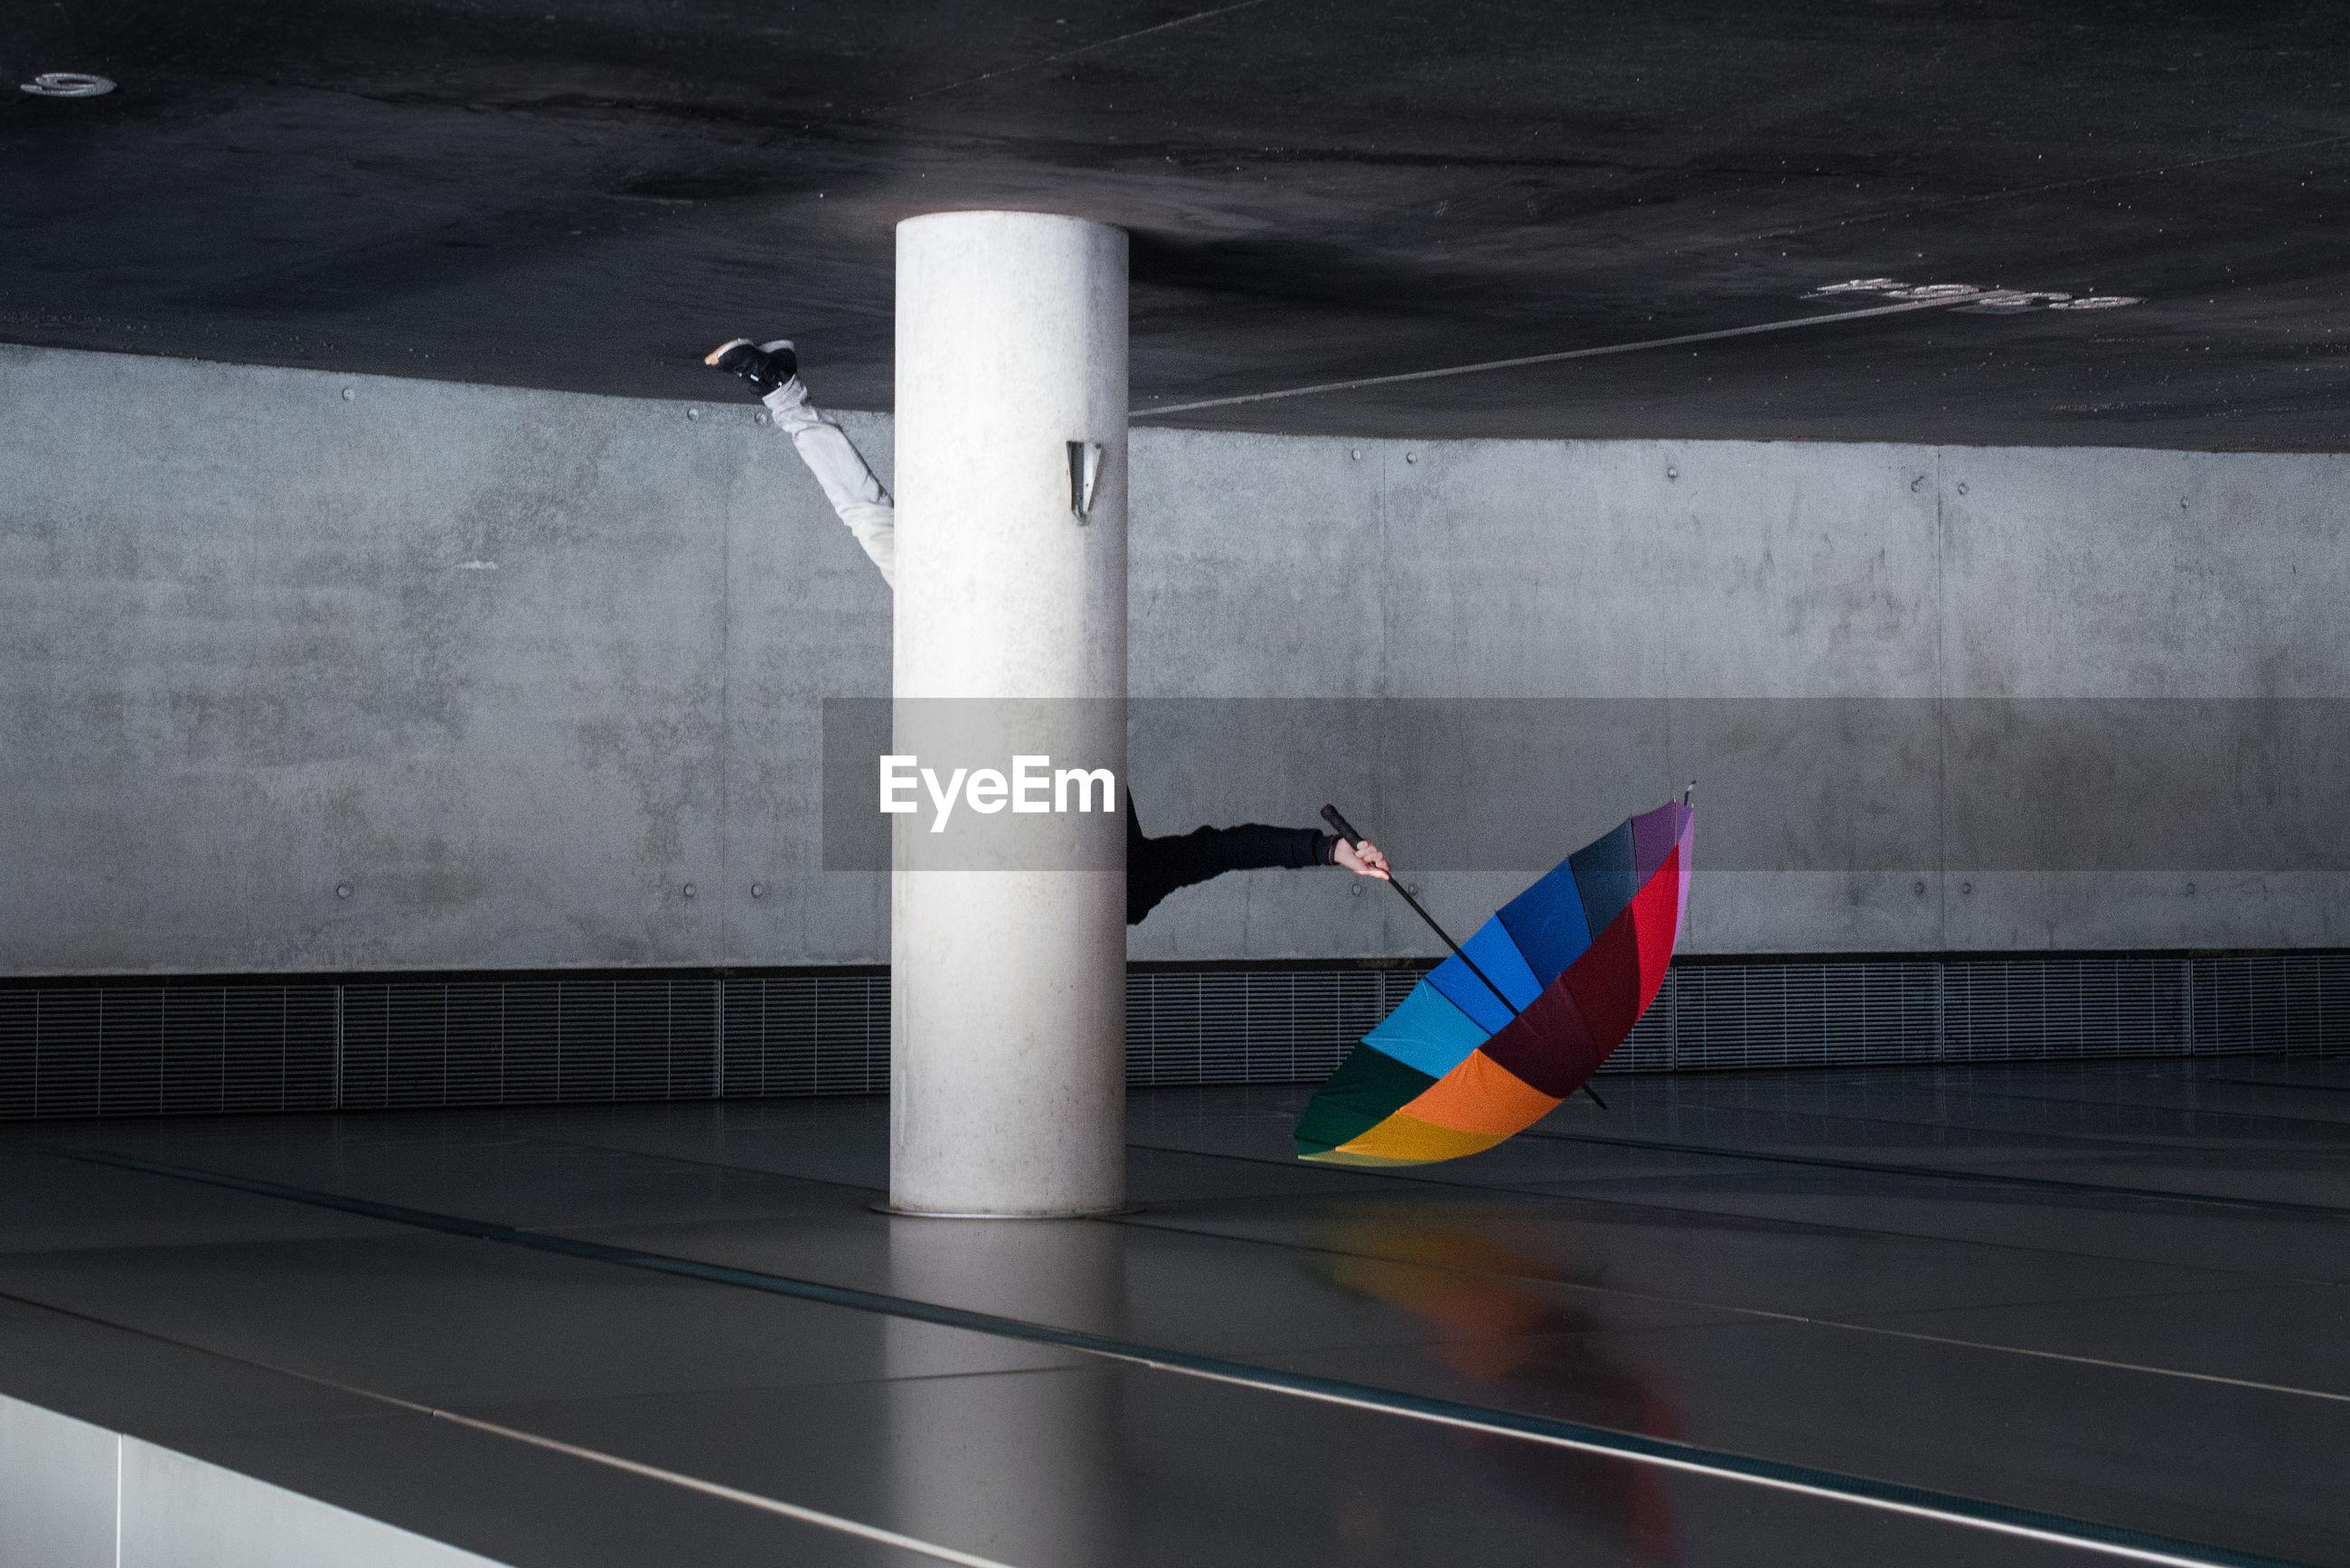 Umbrella on parking lot